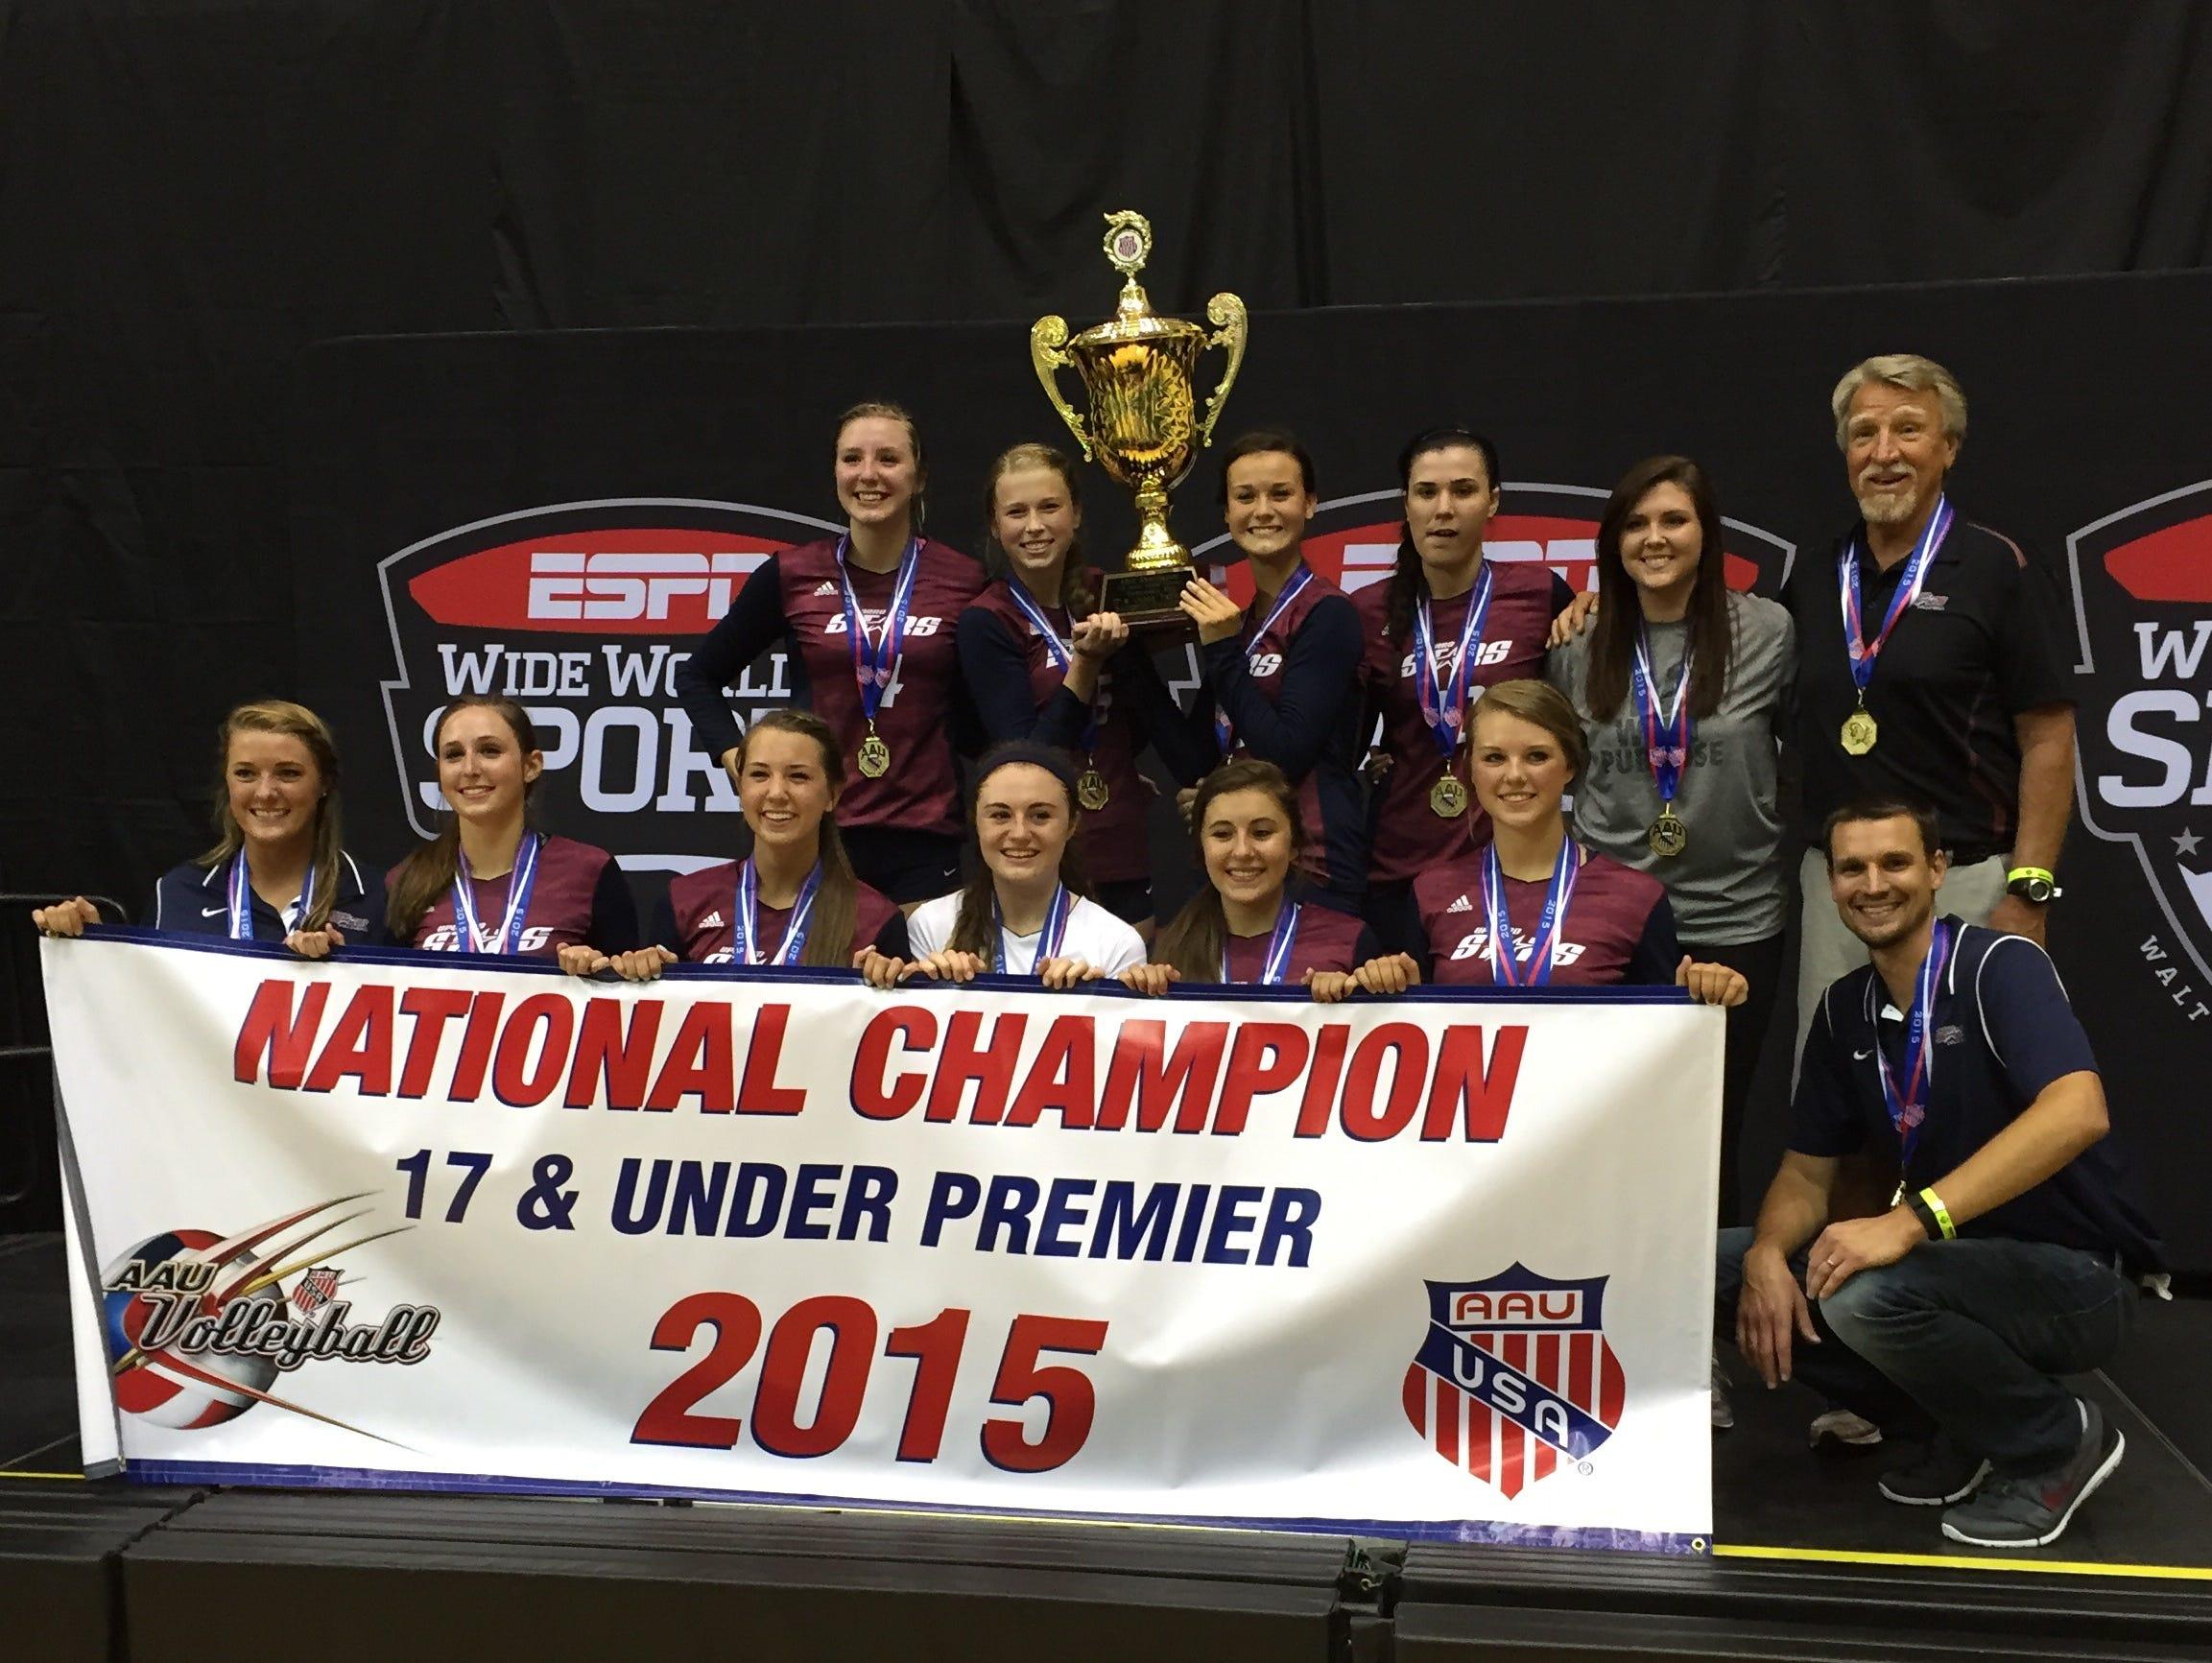 The Upward Stars Premier 17 and under volleyball team.